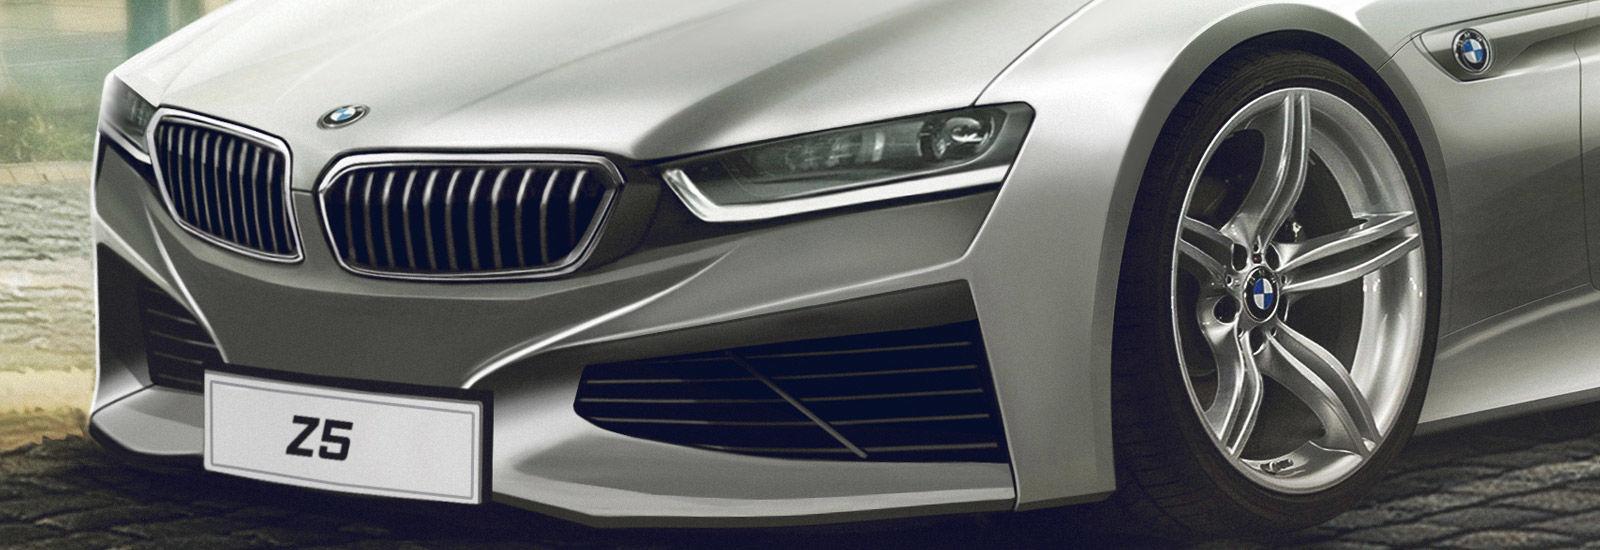 BMW Z5 (Z4 replacement) price, specs & release date | carwow